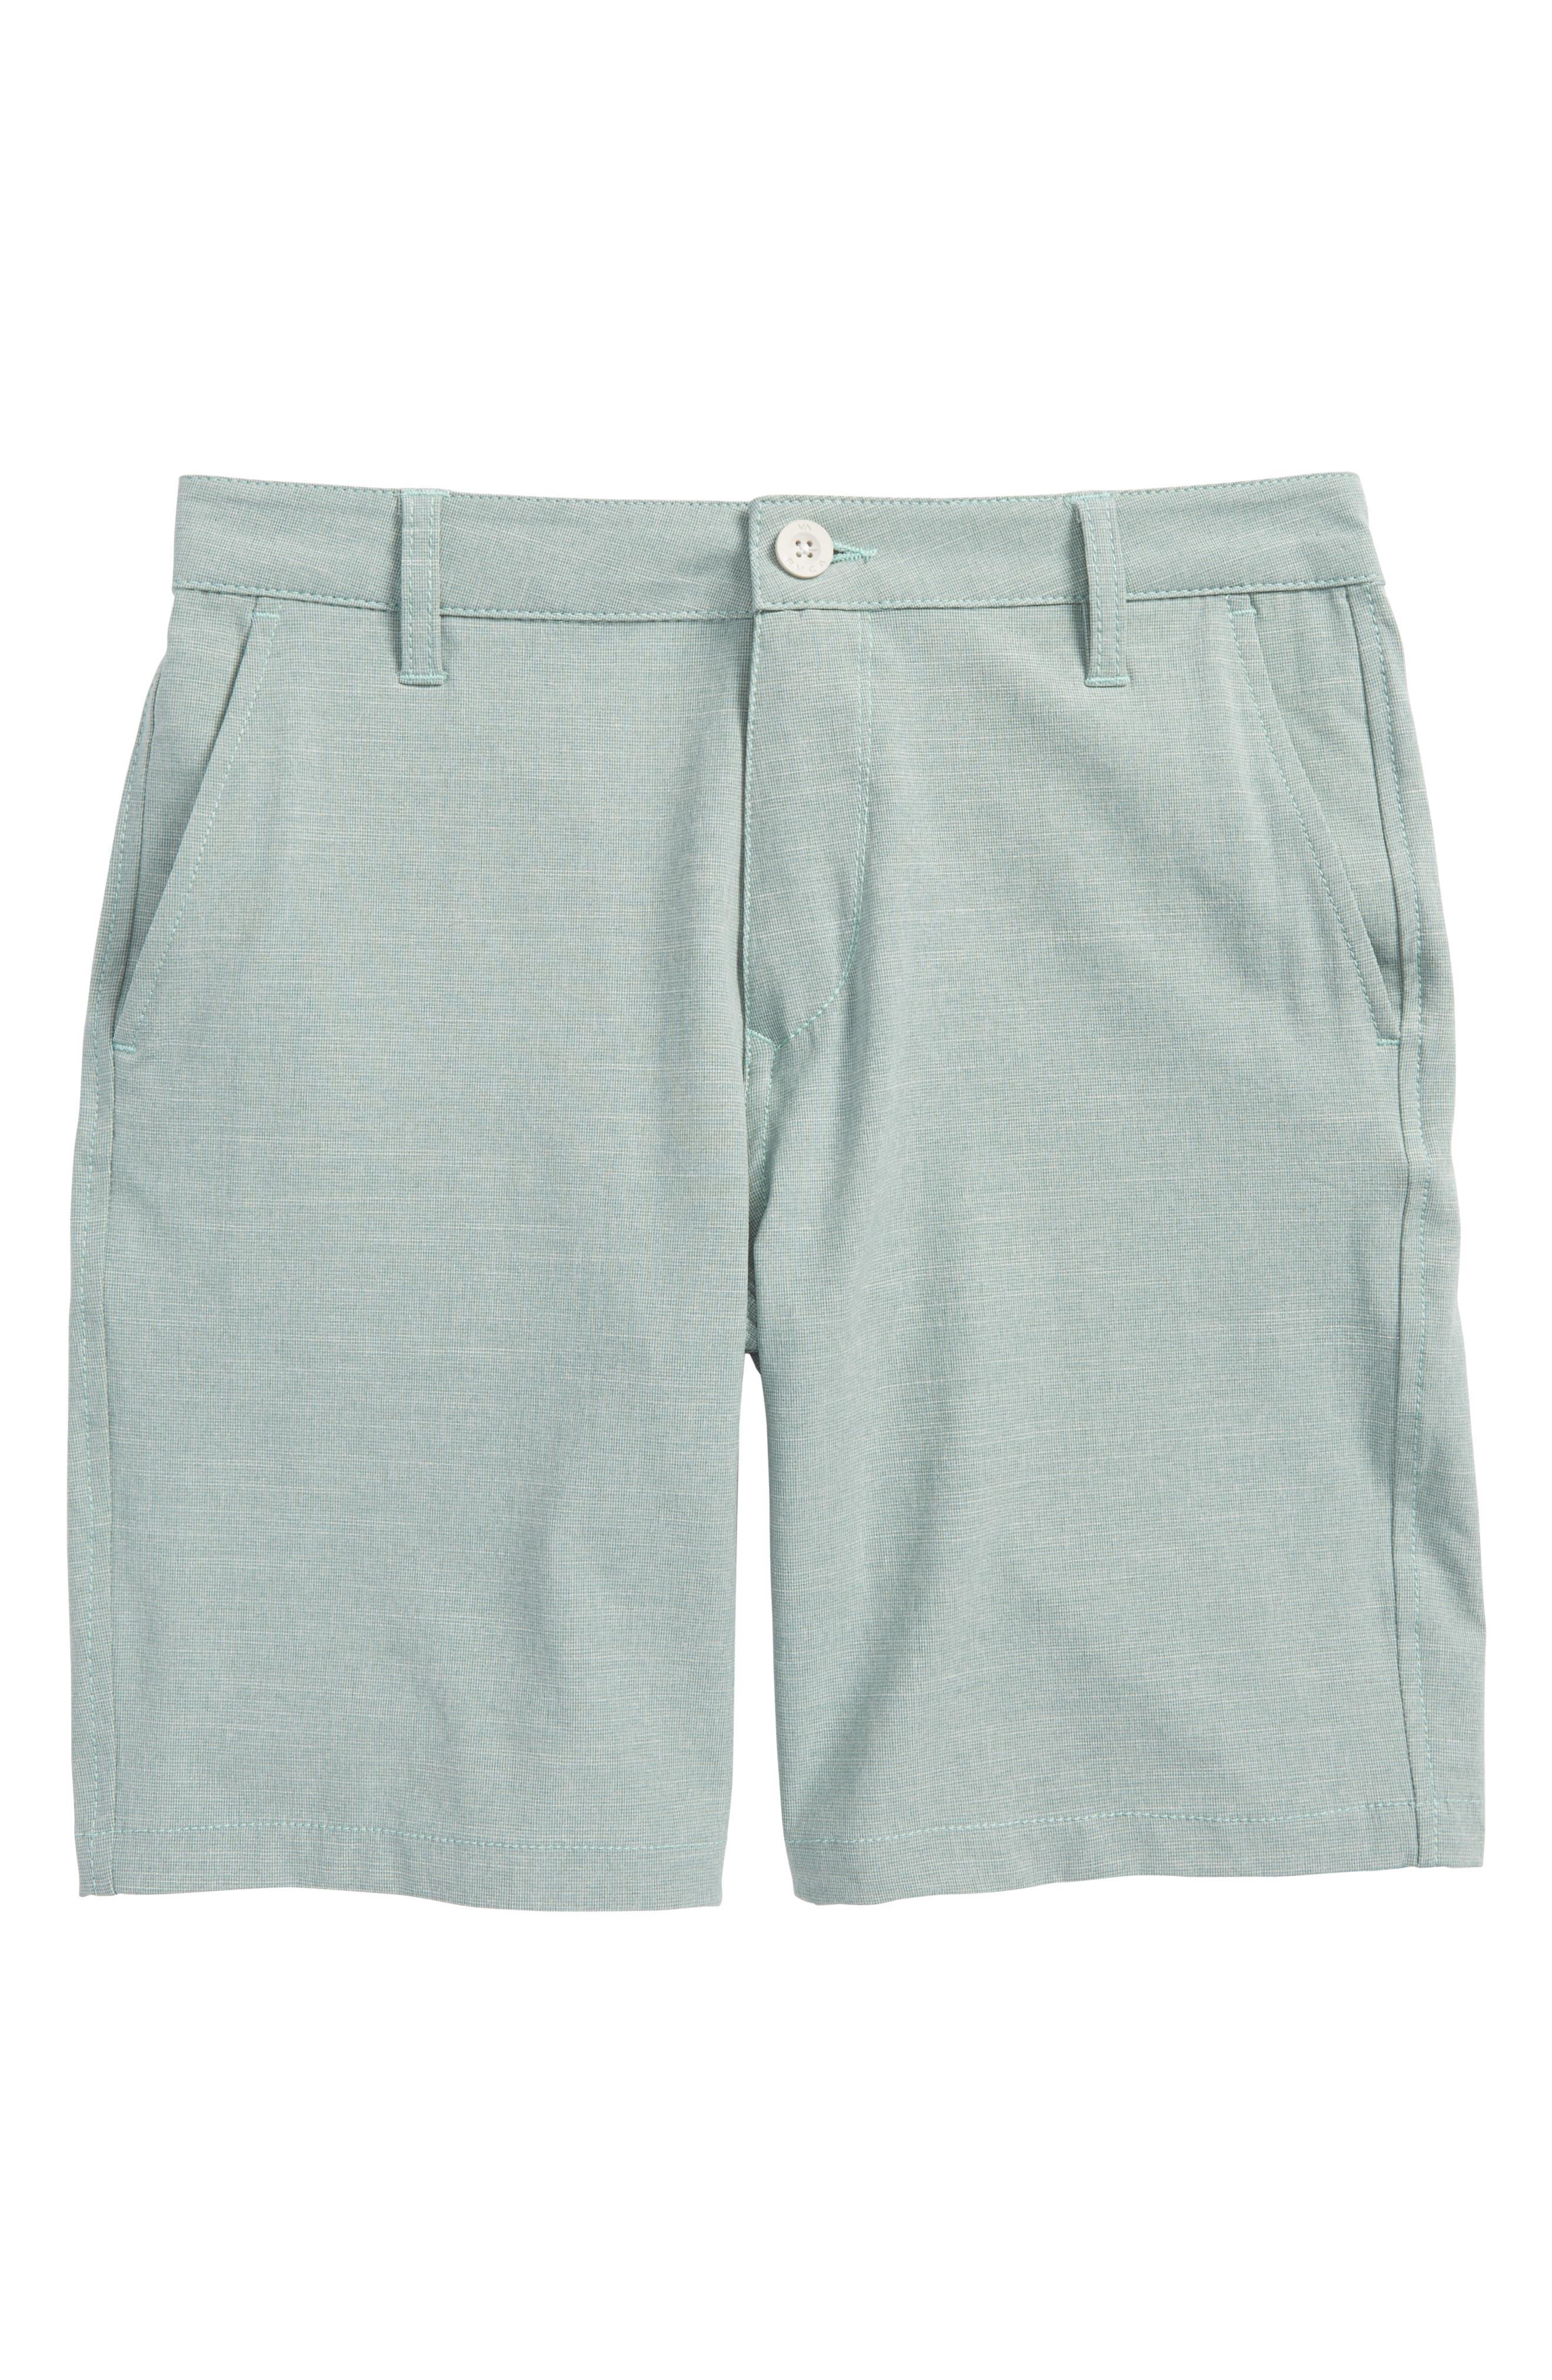 Balance Hybrid Board Shorts,                             Main thumbnail 1, color,                             Green Haze